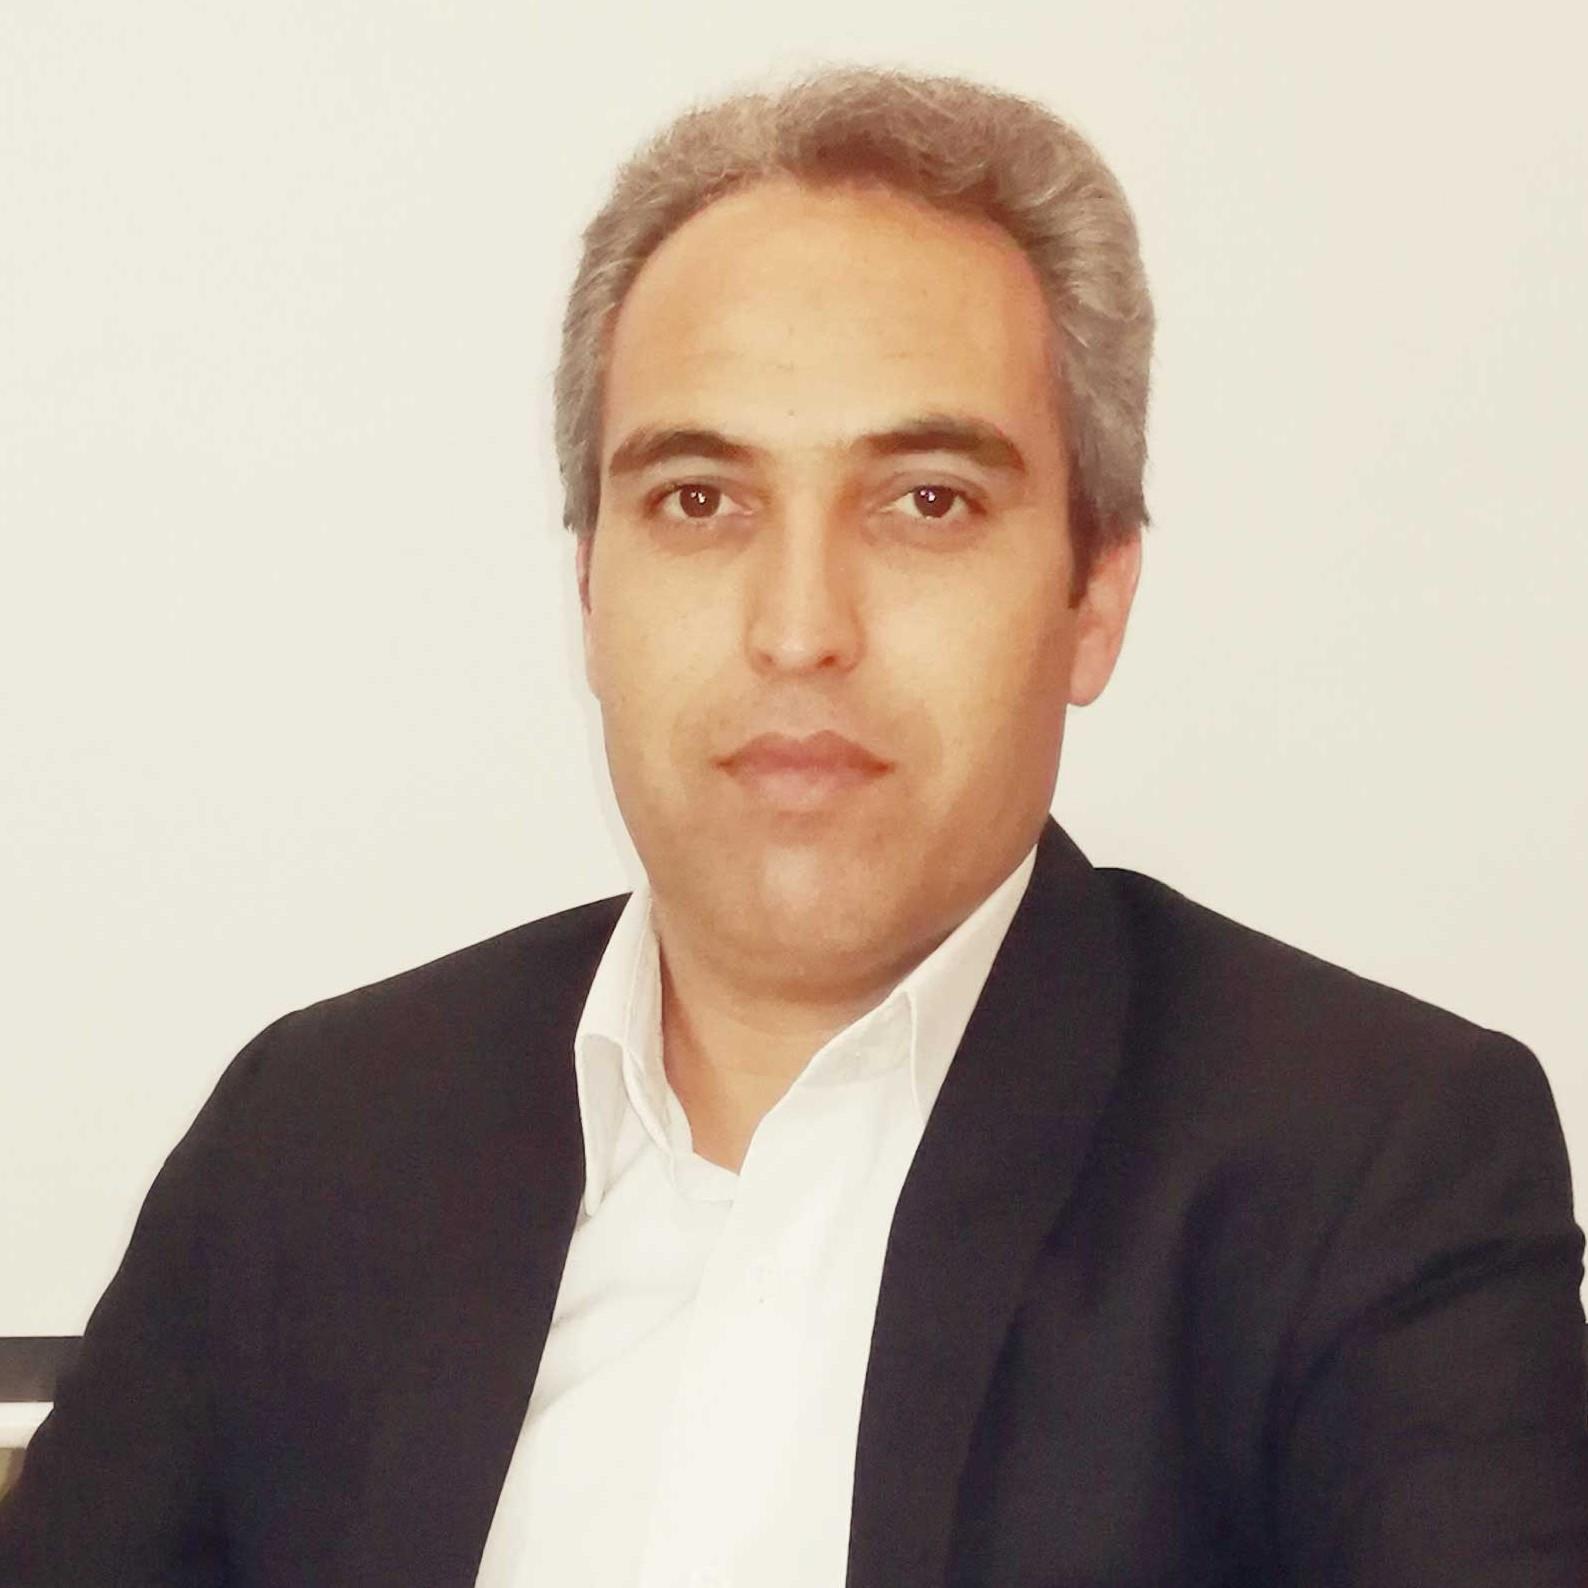 محمد ناصری